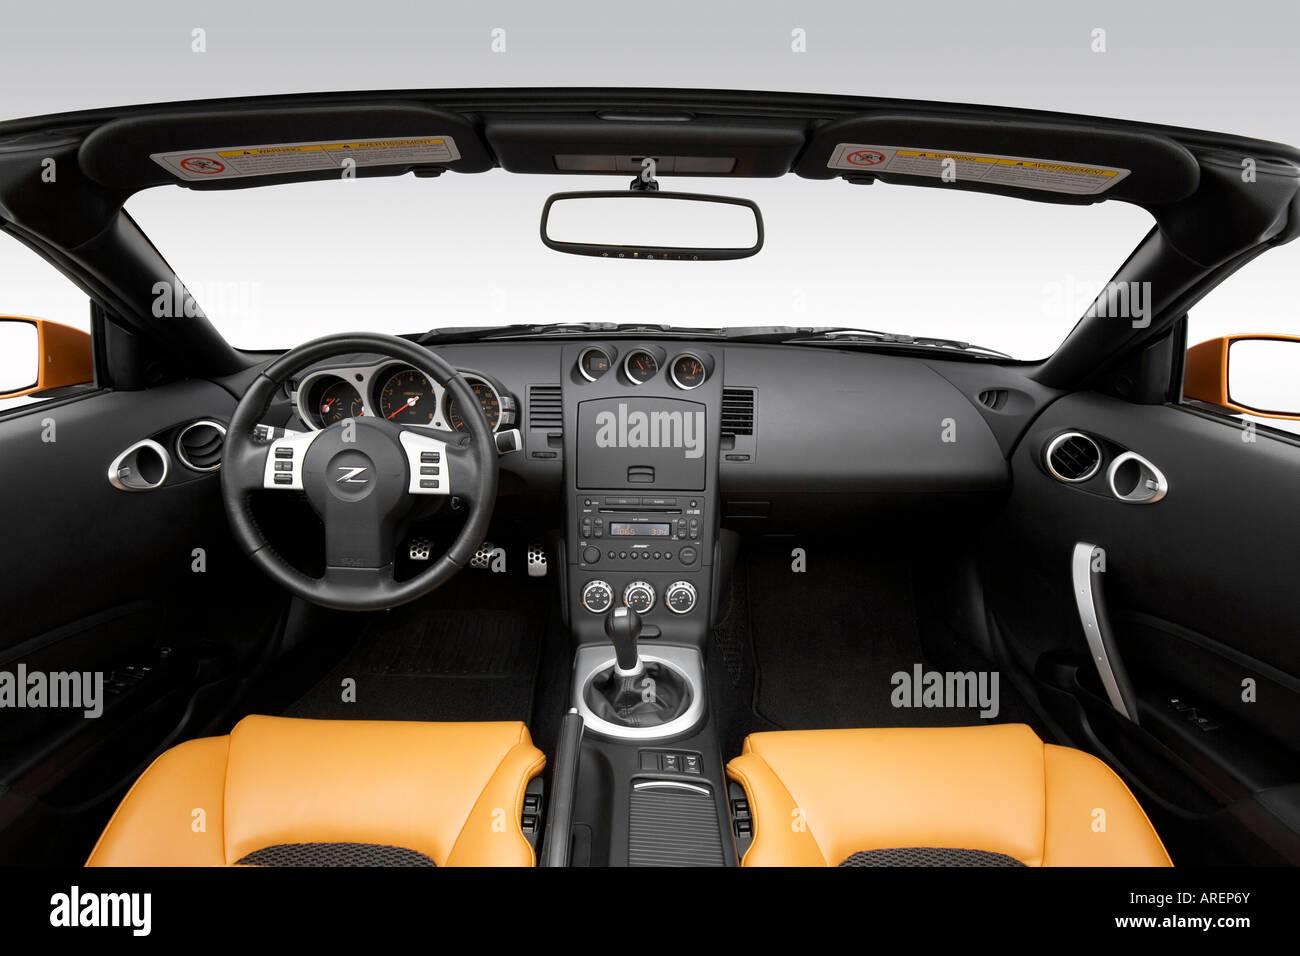 2006 nissan 350z roadster grand touring in orange dashboard